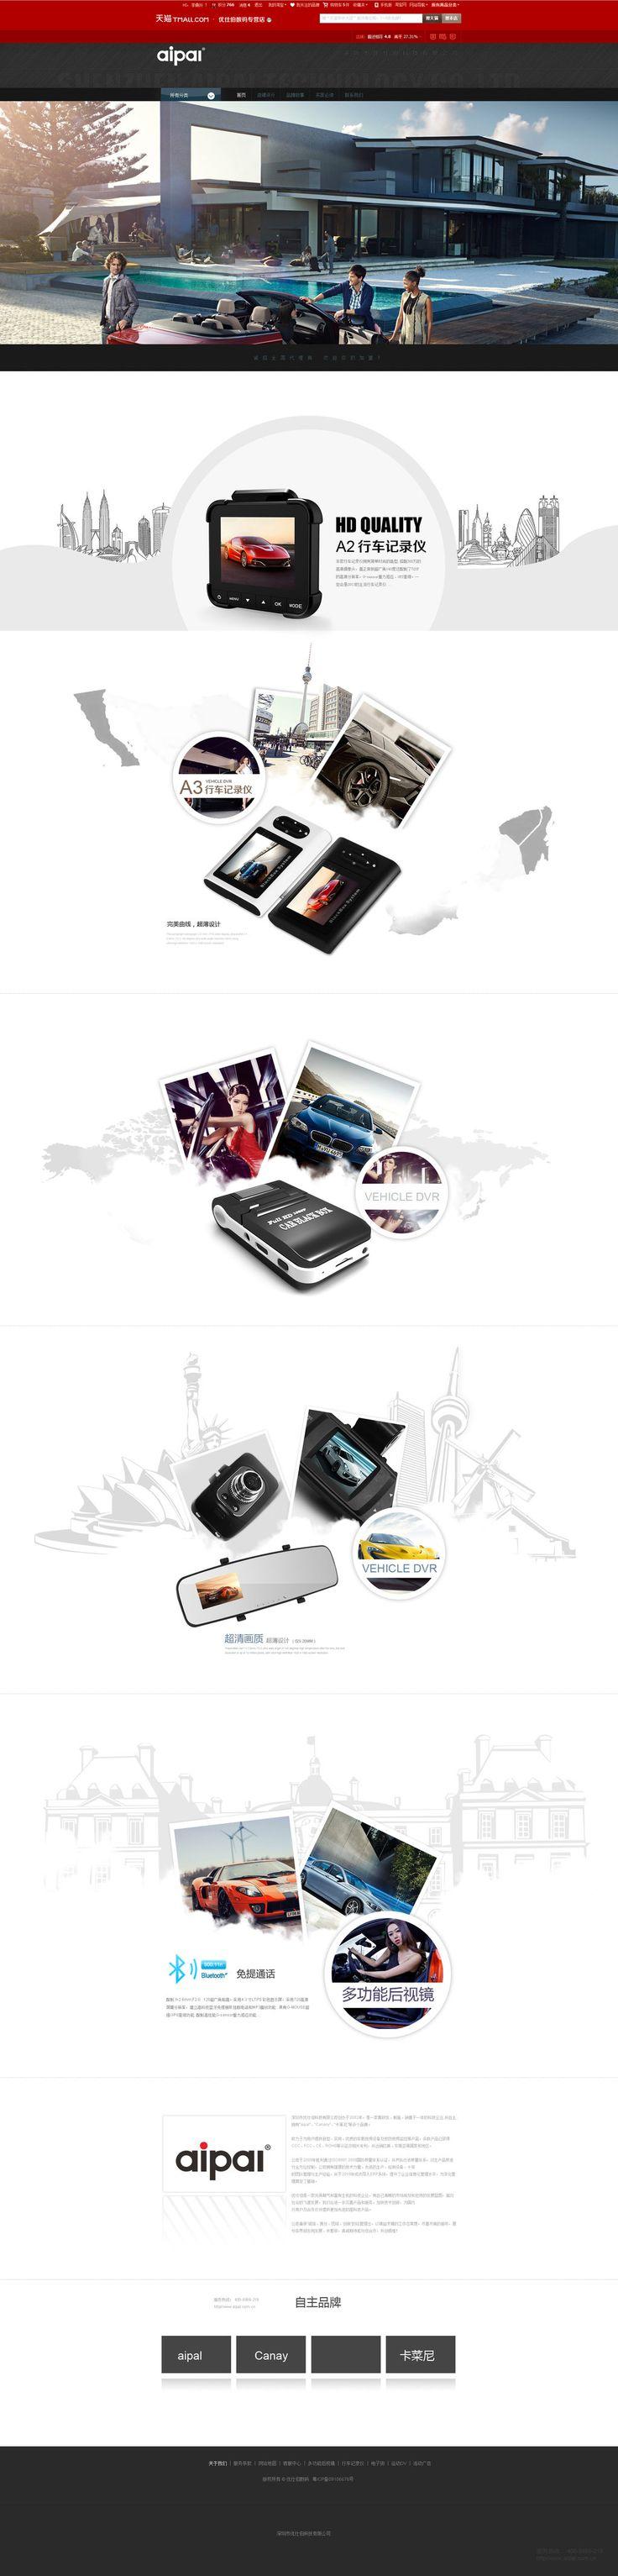 Station Auto Website Automotive website Taobao by lidingling.deviantart.com on @deviantART